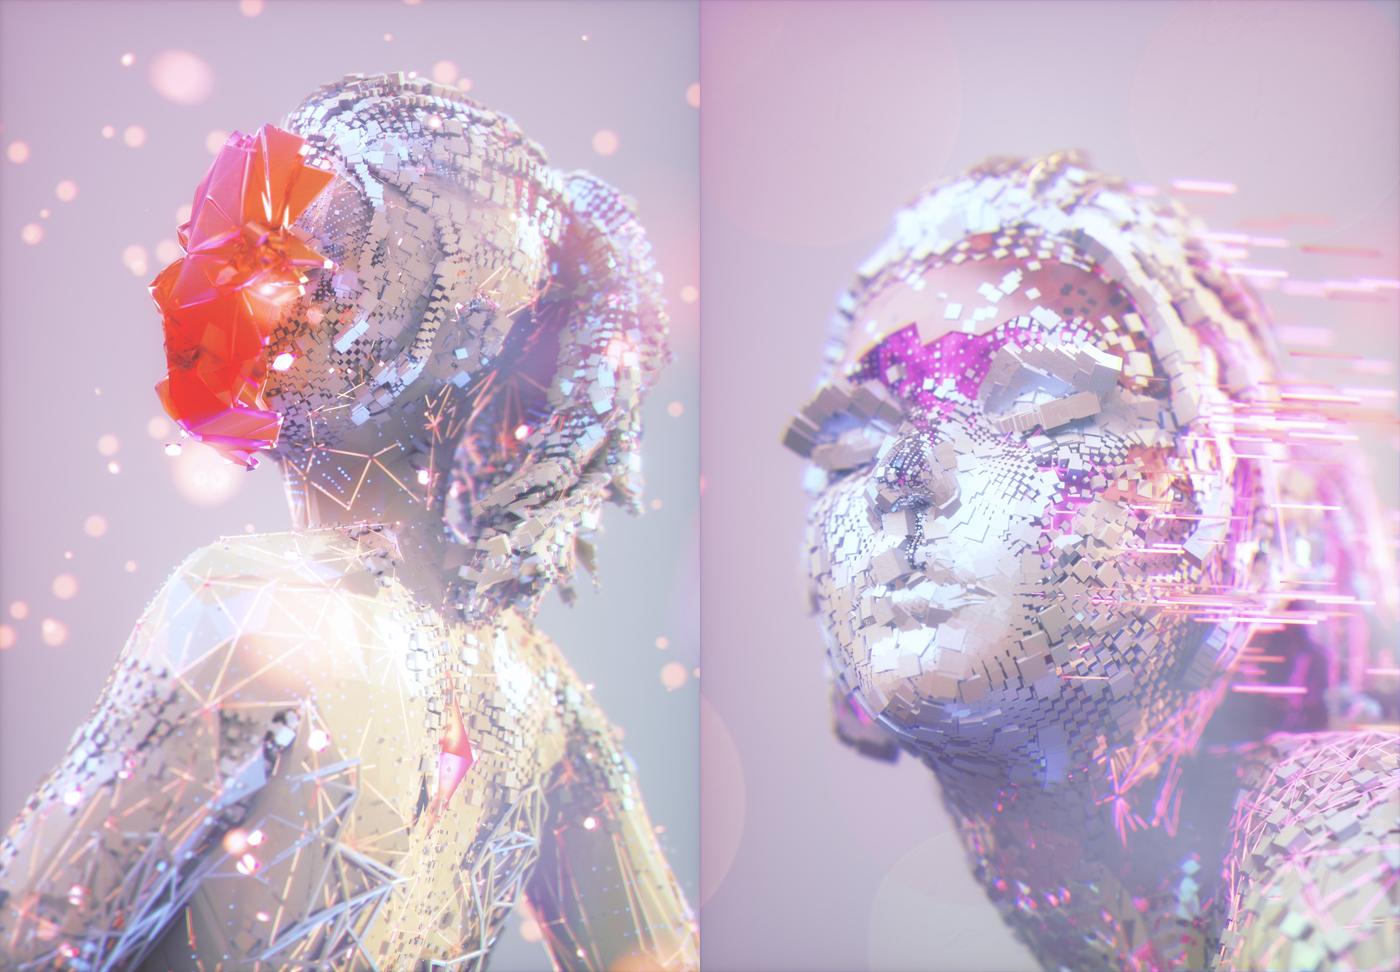 Digital Art & Illustration: NEOMANCER by Kirill Maksimchuk